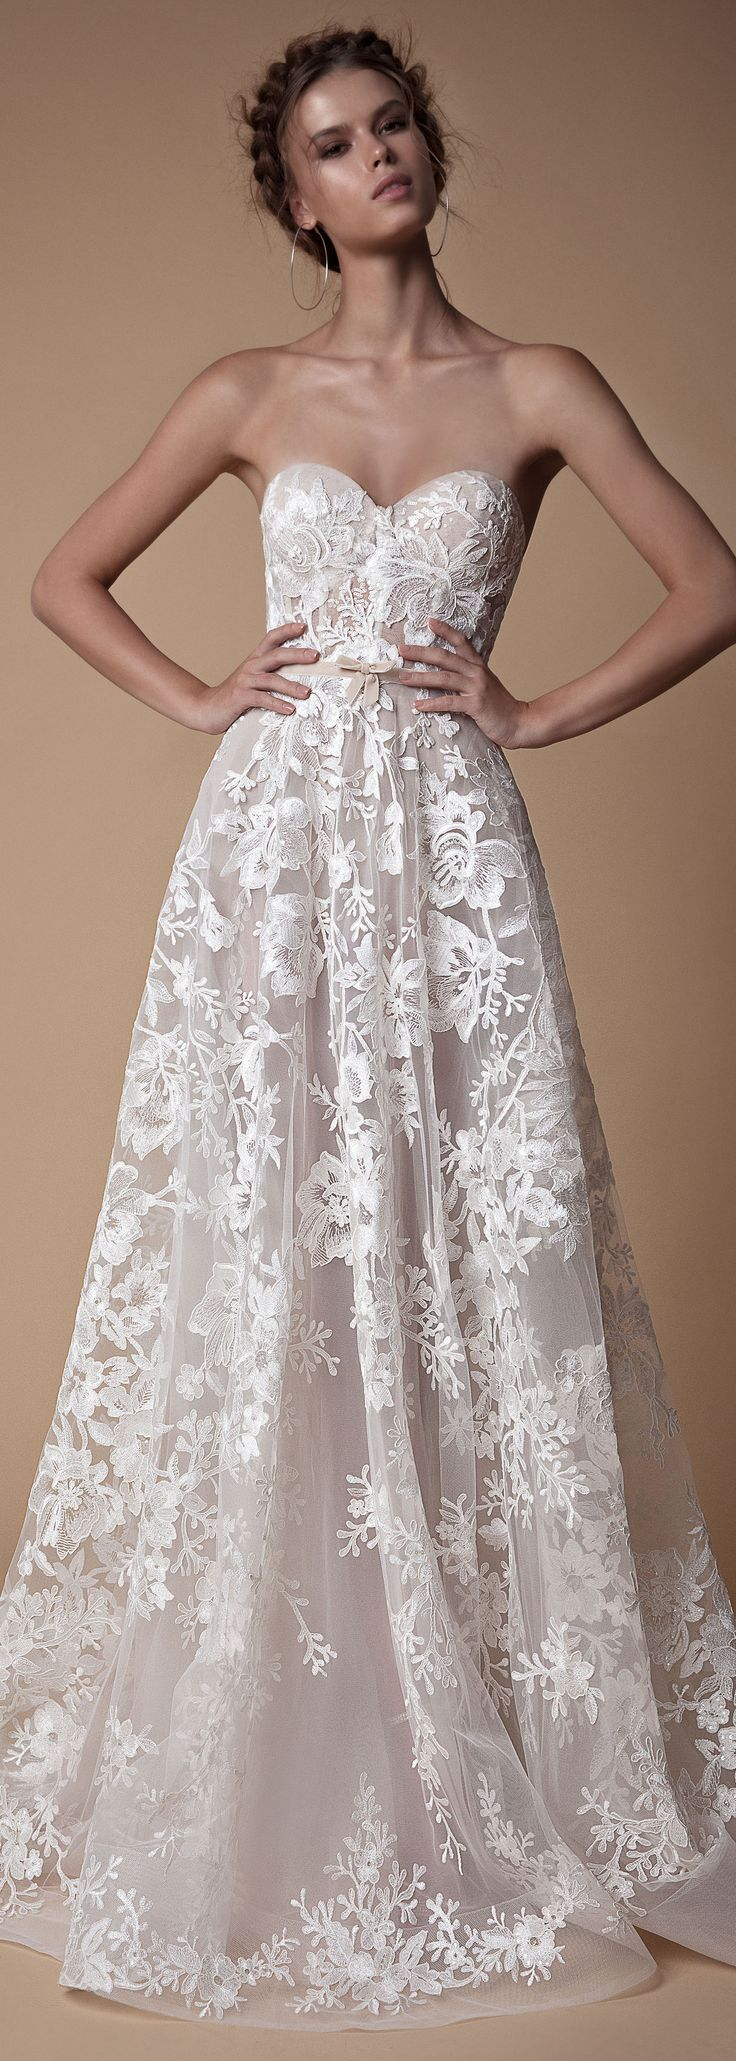 best weddings images on pinterest bridal gowns short wedding